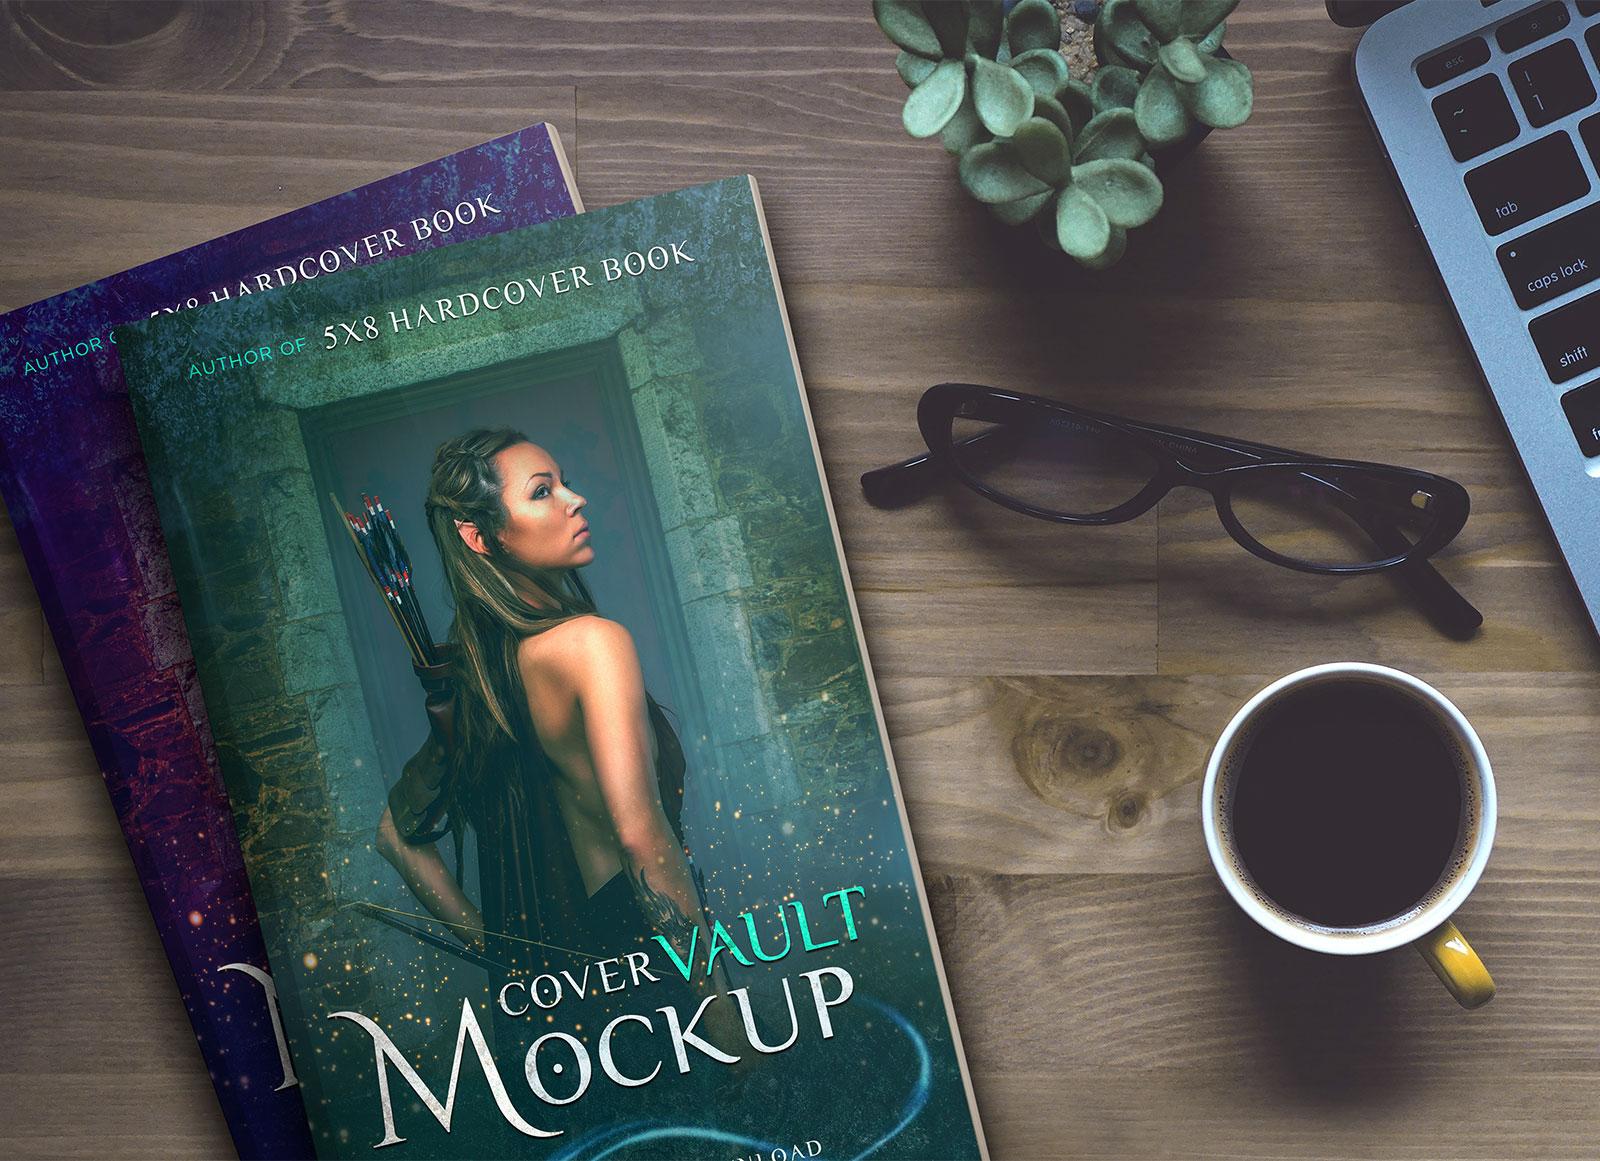 Free-5-x-8-Hardcover-Book-Mockup-PSD